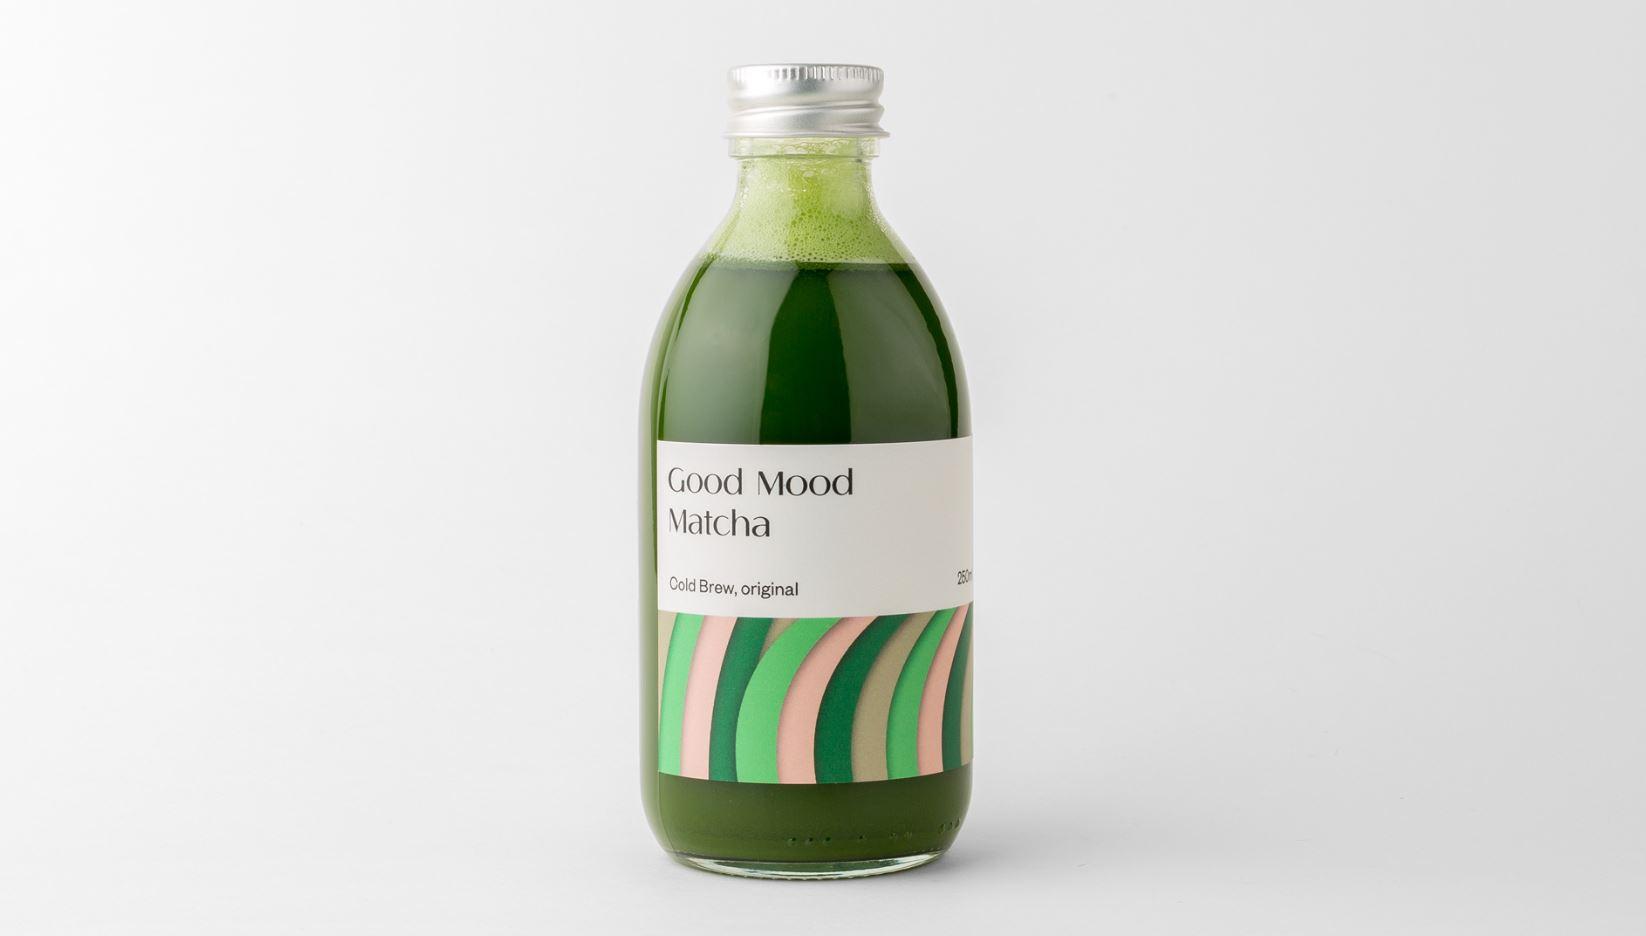 Good Mood Match抹茶品牌形象和包装设计